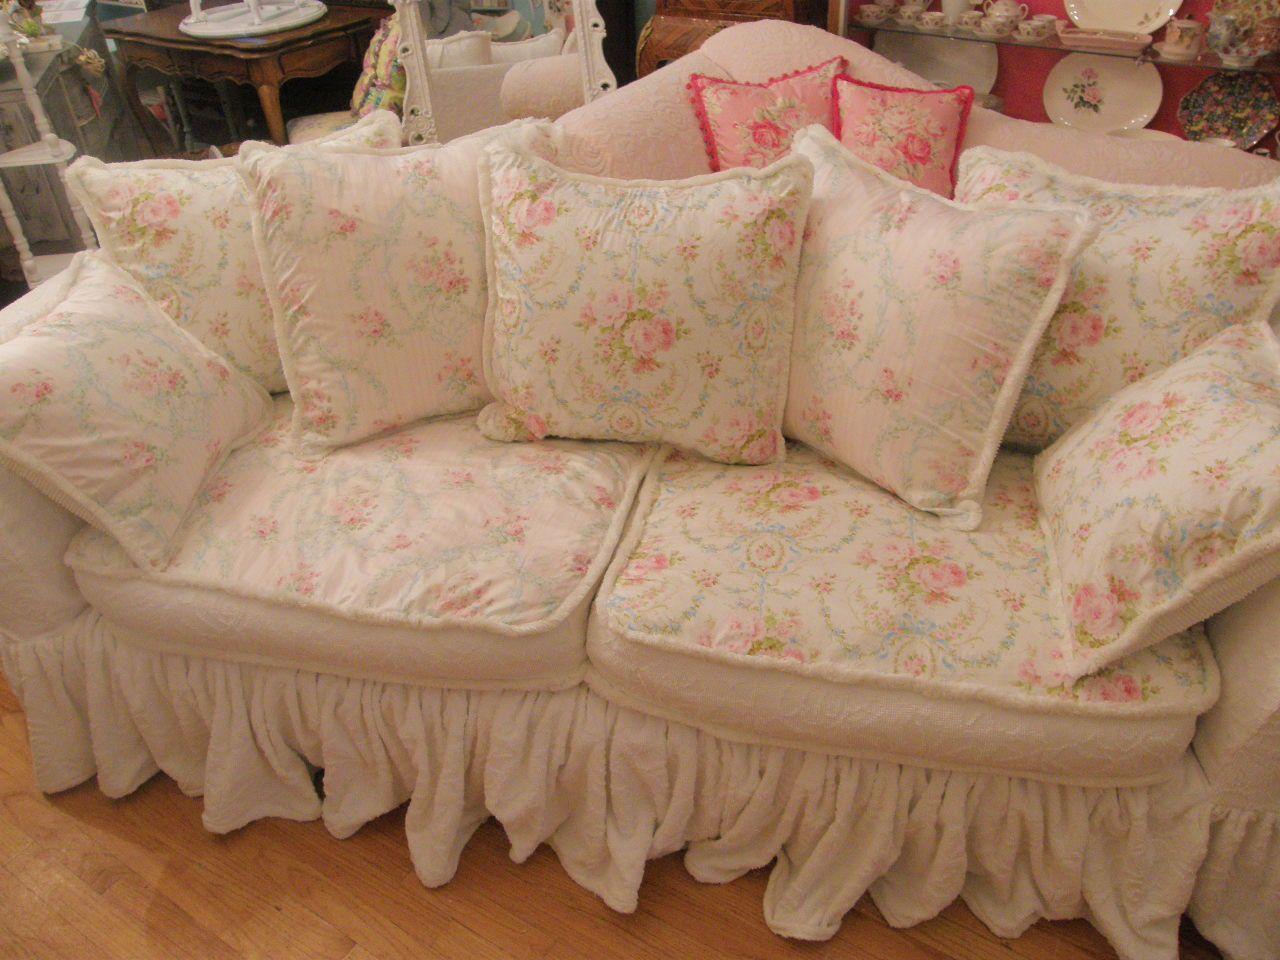 Vintage Chic Furniture Schenectady NY: Shabby Chic Slipcovered .